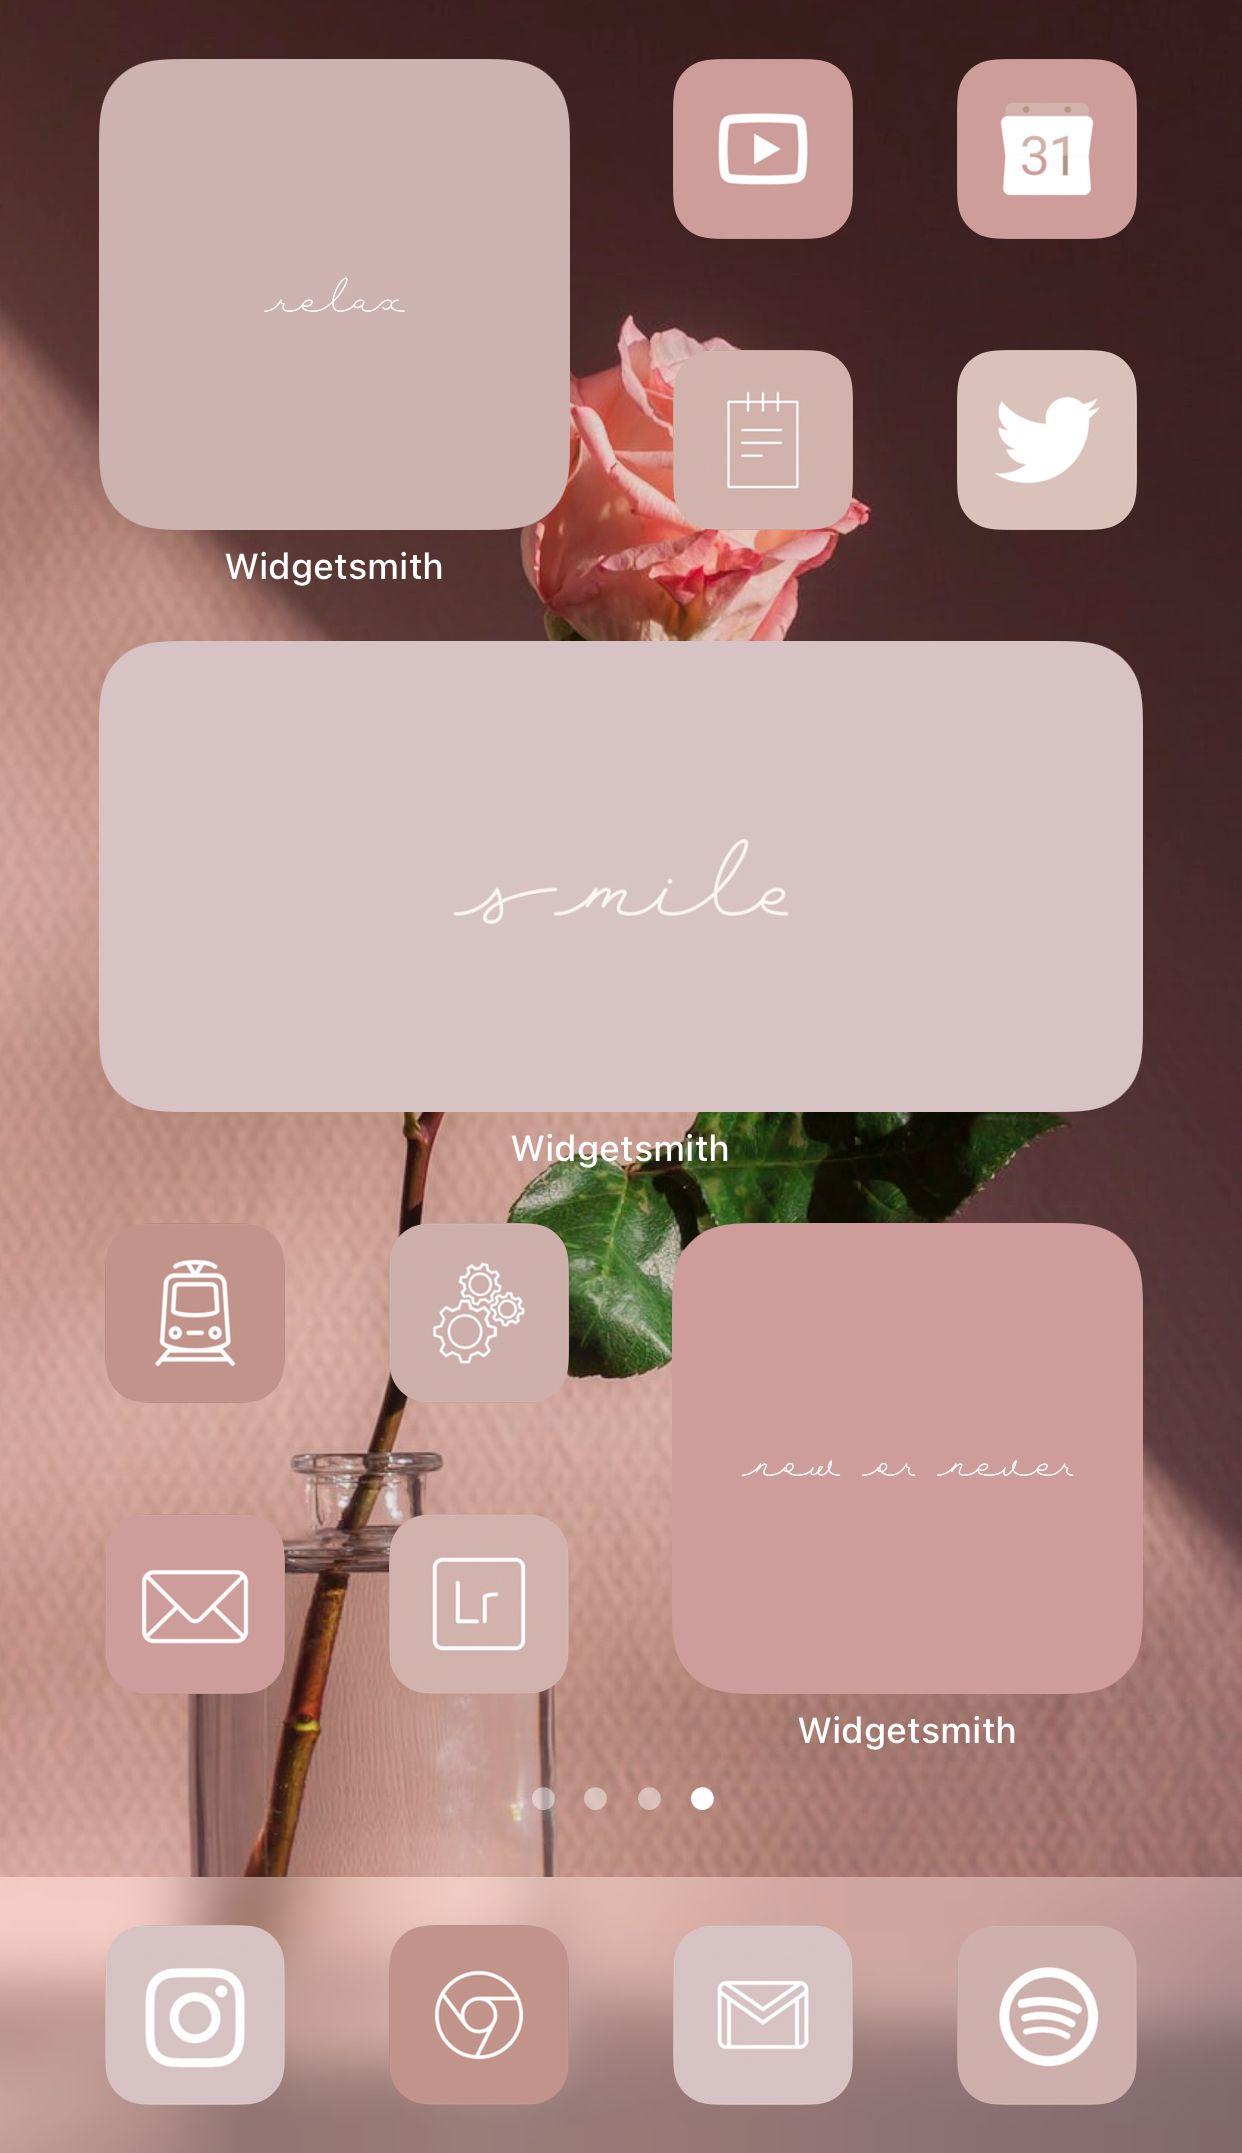 Rose Pink Neutral Aesthetic Ios 14 Ipados App Icons Ios14 Widget Cover Photos Widgetsmith Aesthetic App Icon Pack Aesthetic Icons Iphone Ios App Iphone App Icon Ios App Icon